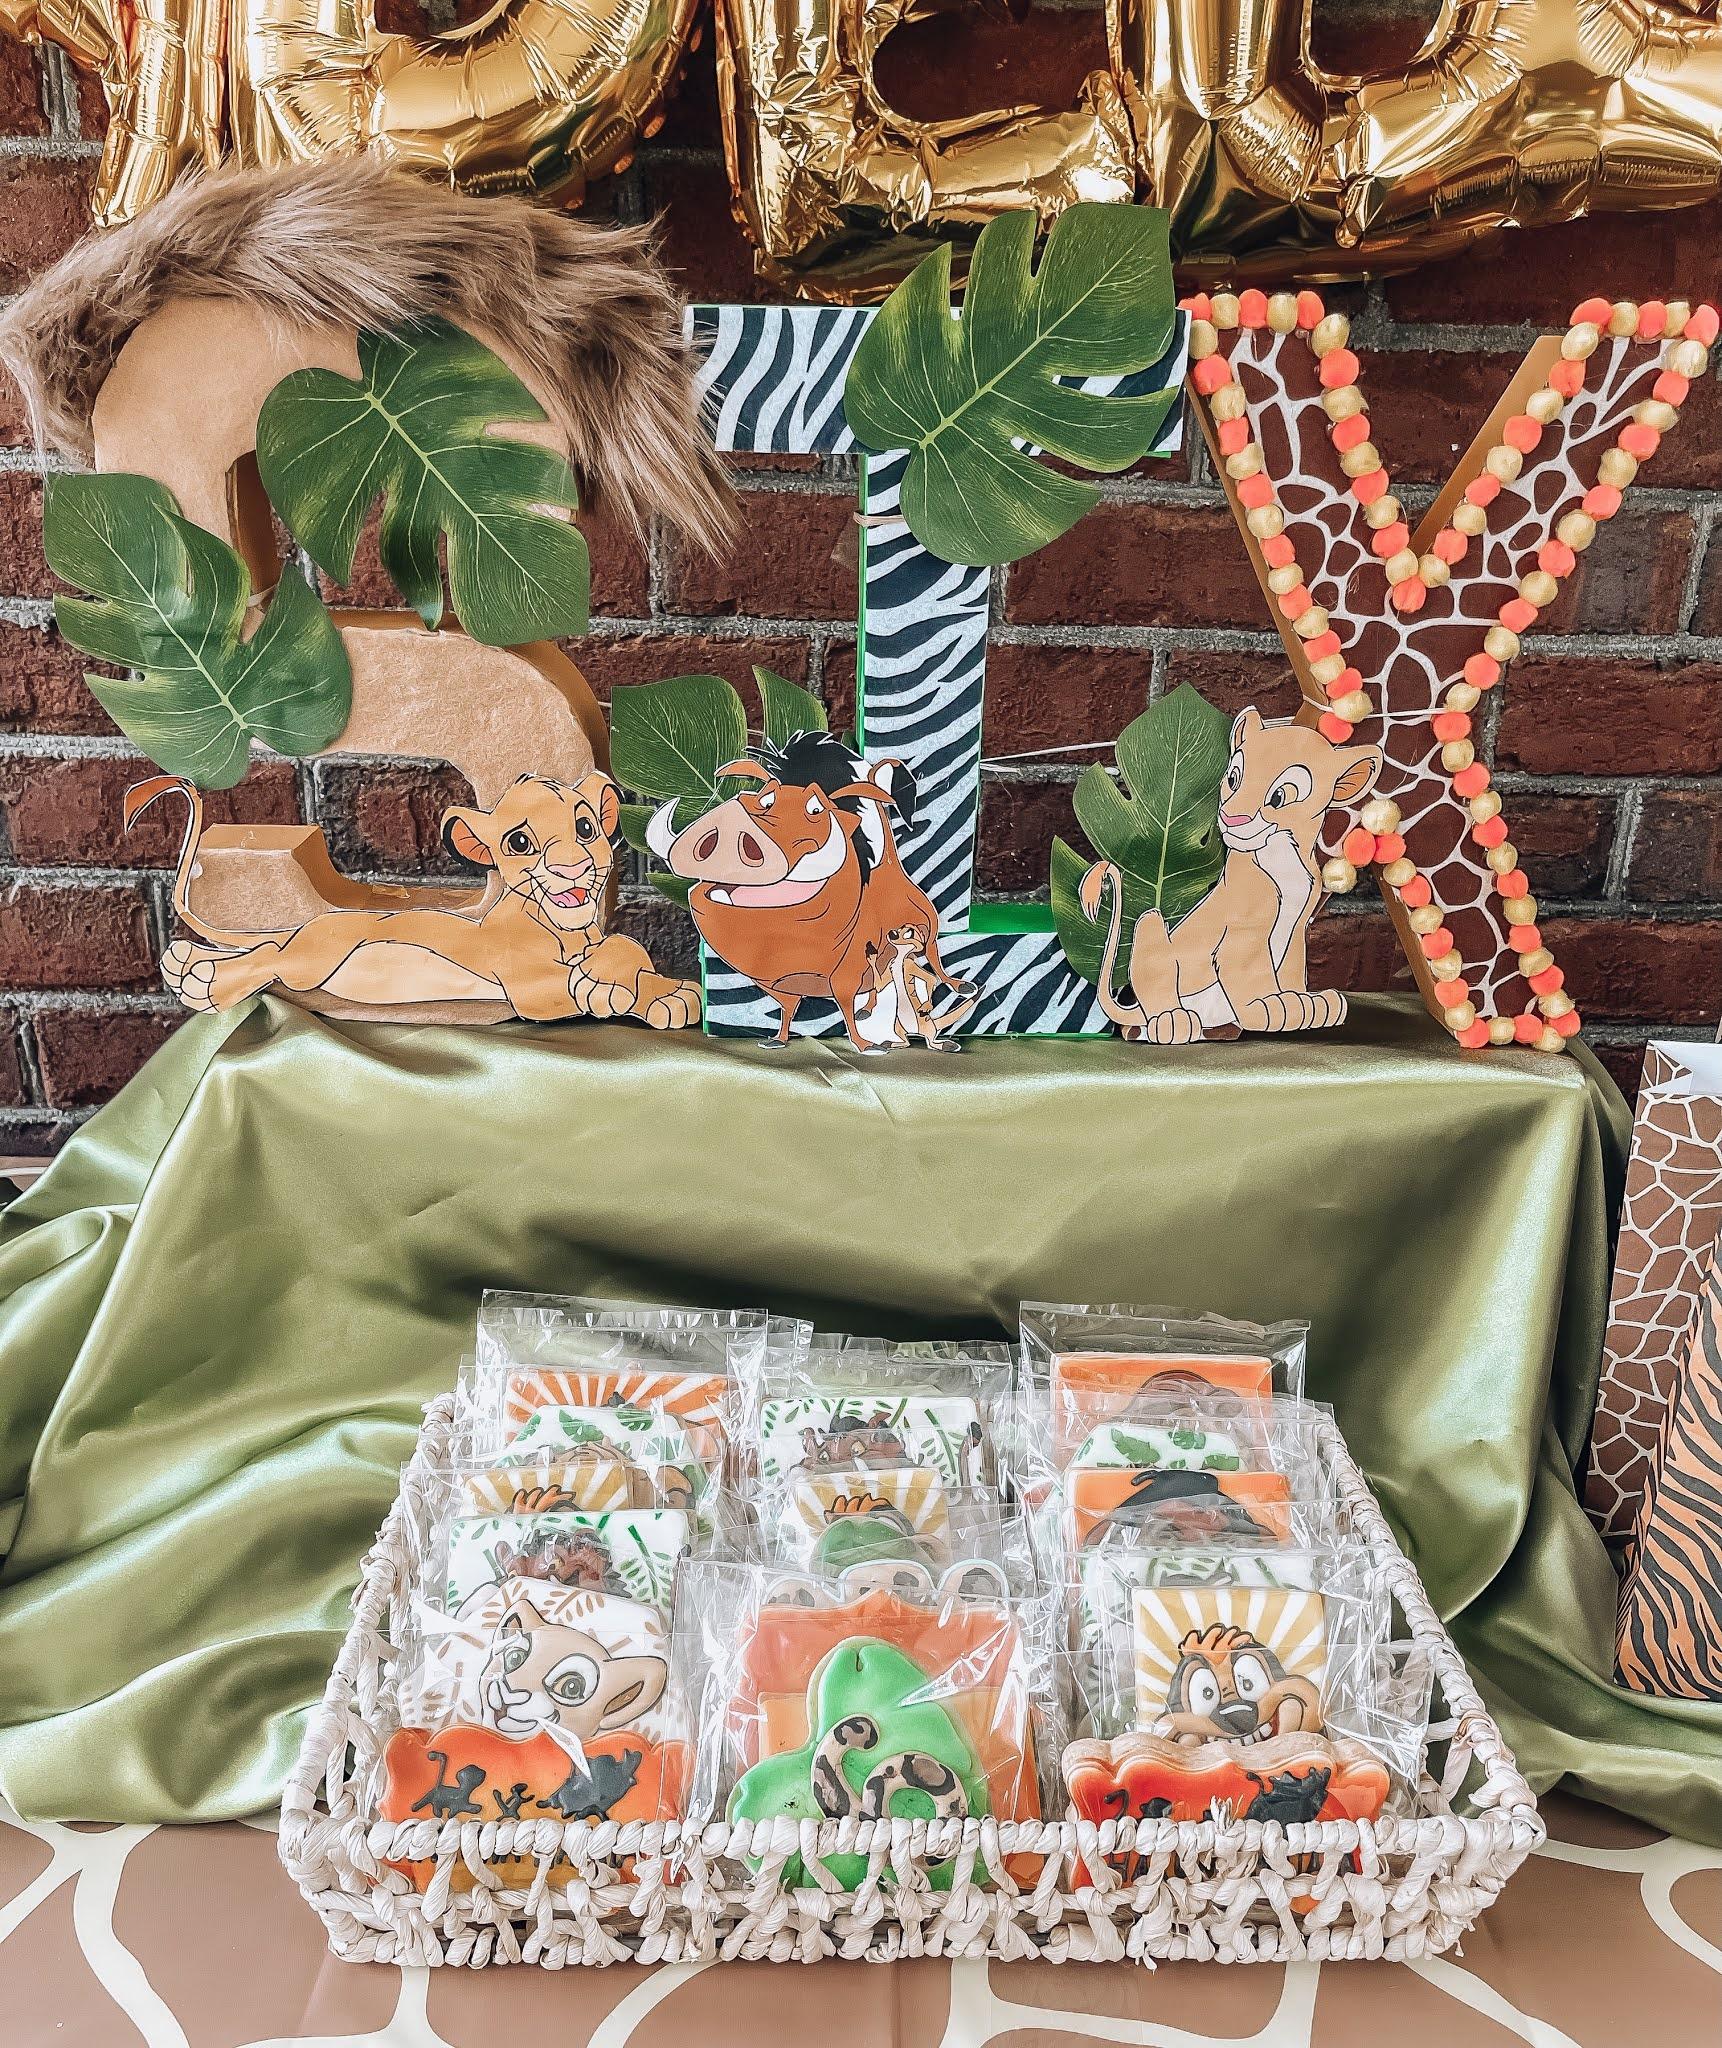 Madeline's Lion King 6th Birthday Party - Something Delightful Blog #partyideas #kidsbirthdayparty #lionkingparty #wildoneparty #safariparty #animalprintparty